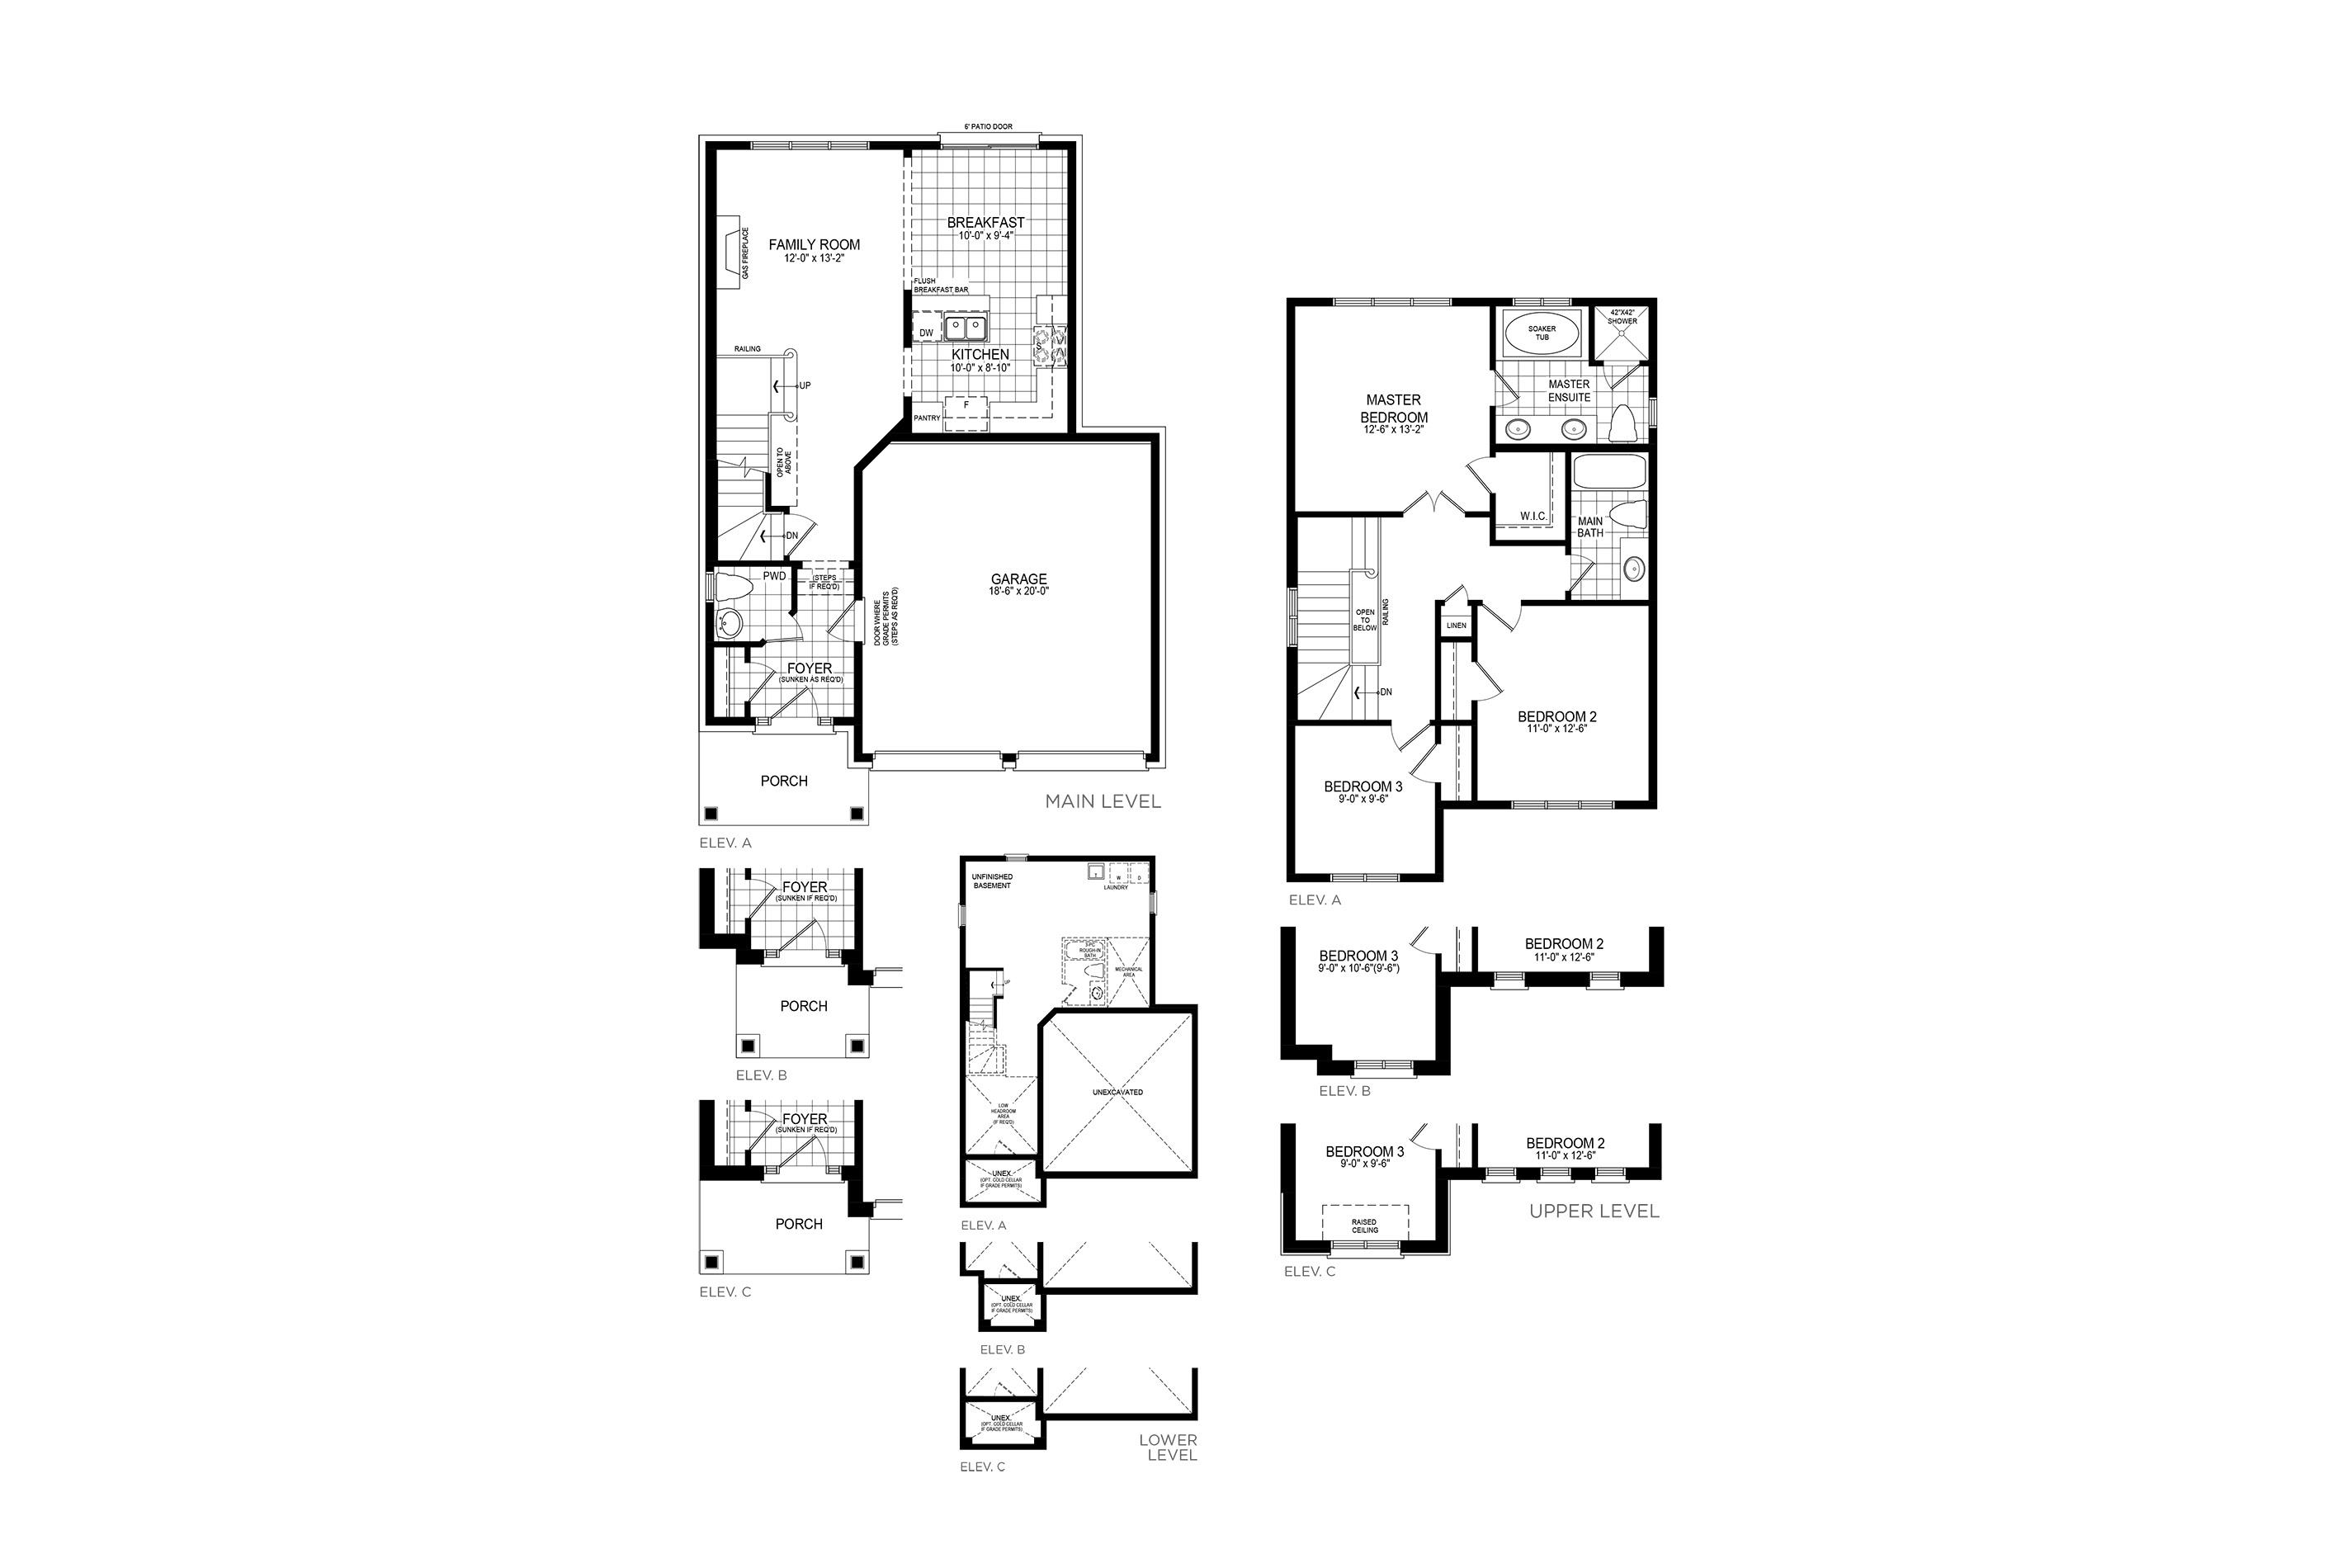 Langley 1 Floorplan